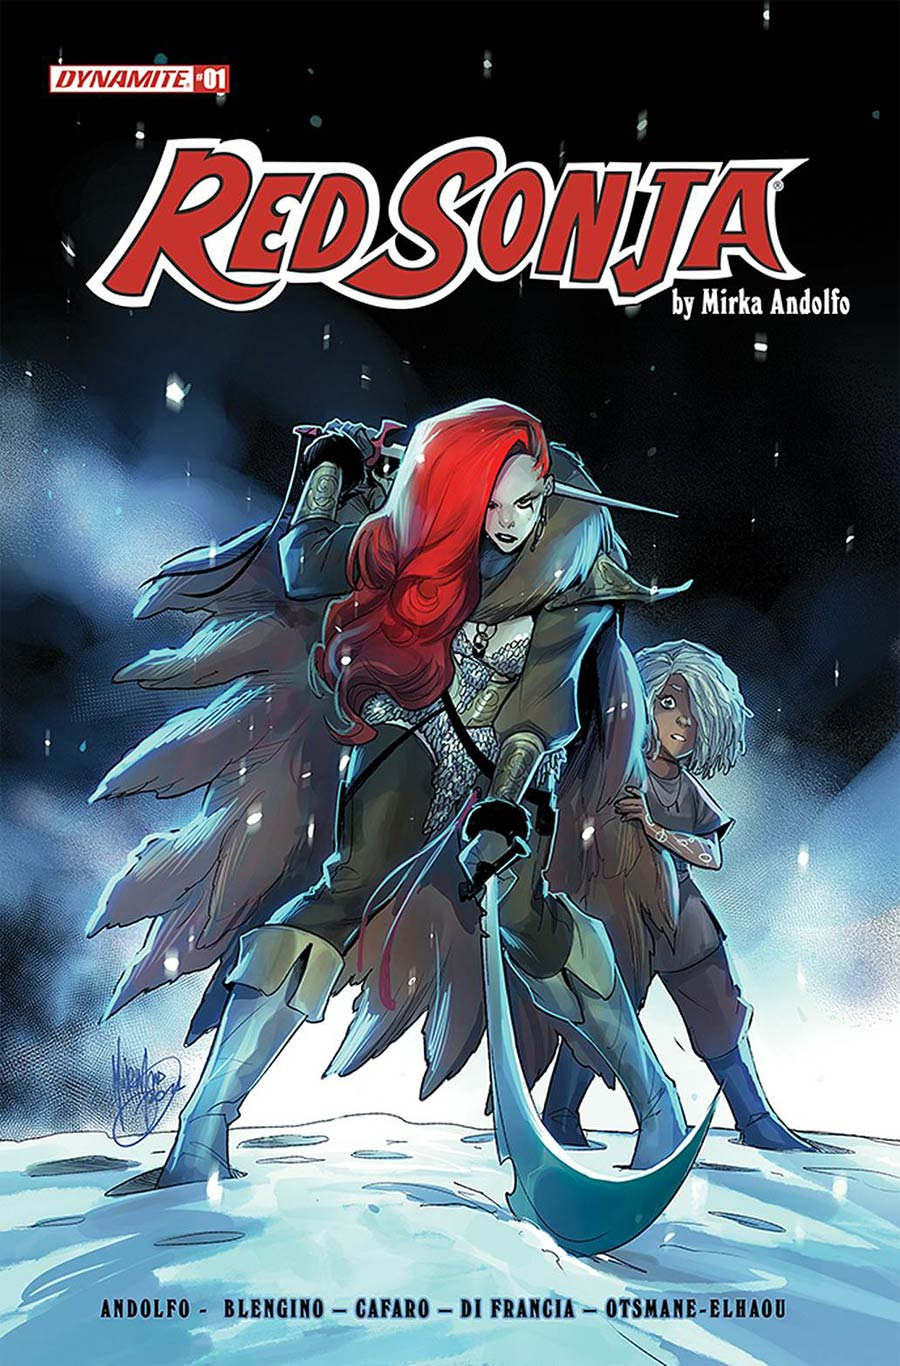 Red Sonja Vol 9 #1 Cover A Regular Mirka Andolfo Cover